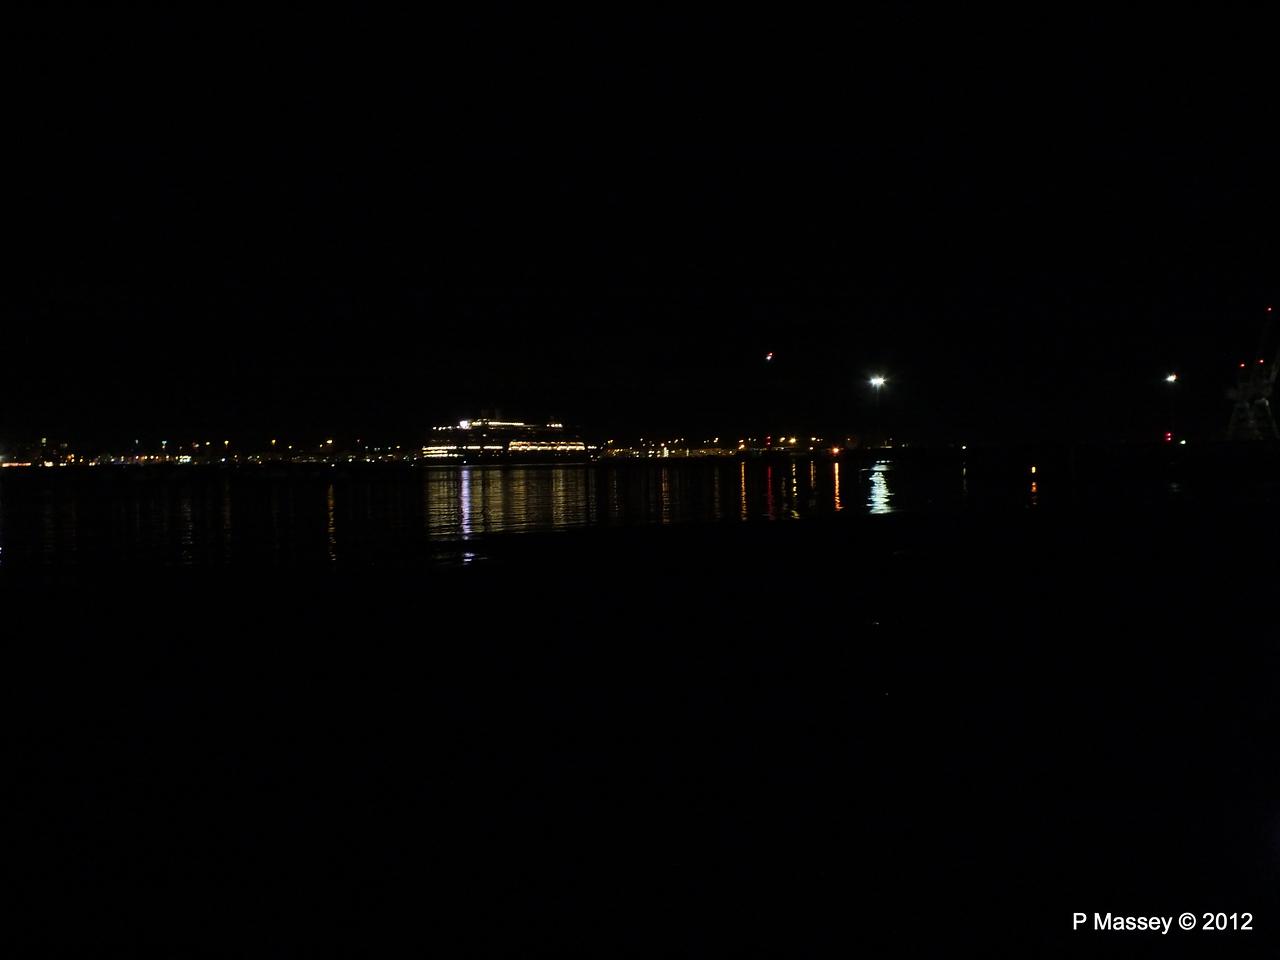 ROTTERDAM PDM 03-11-2012 21-01-57